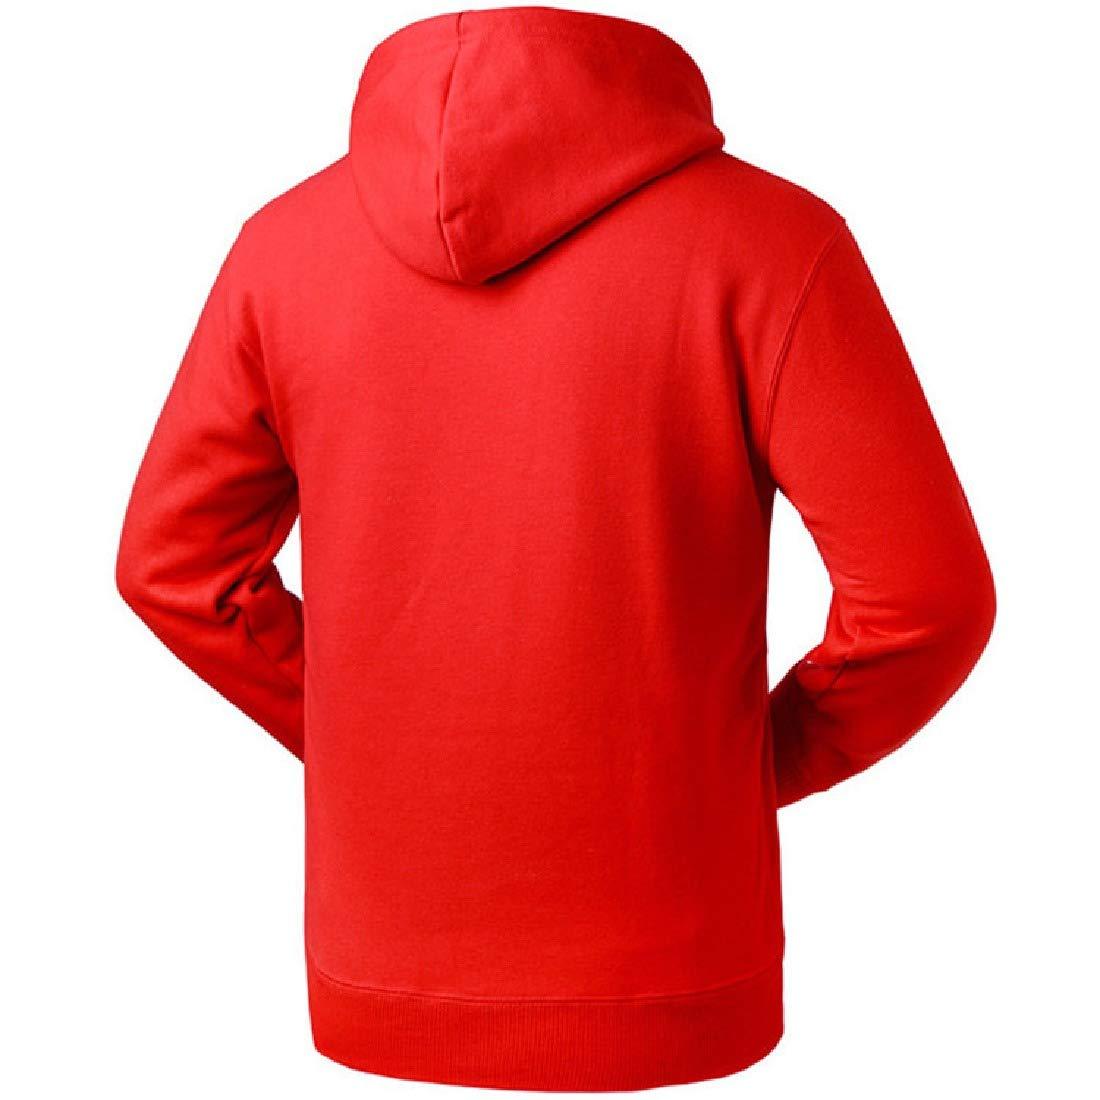 Abetteric Mens Long-Sleeve Pockets Pullover Drawstring Hooded Juniors Shirt